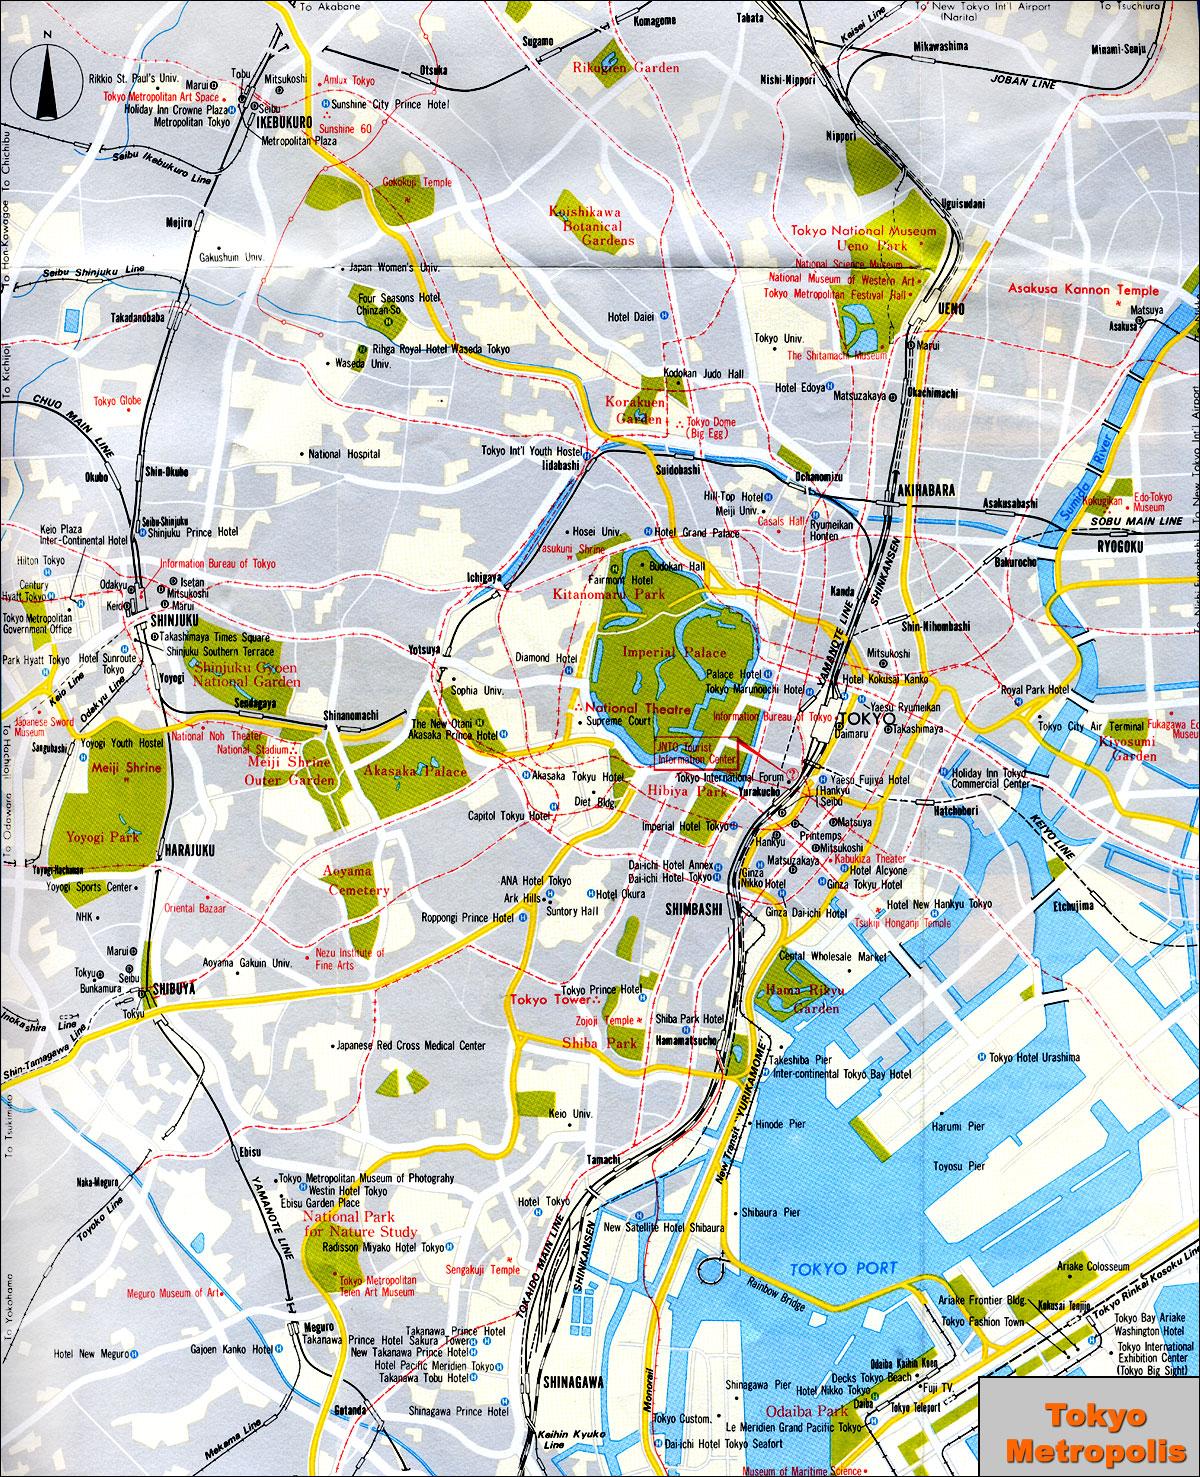 www.Mappi.net : Maps of cities : Tokyo